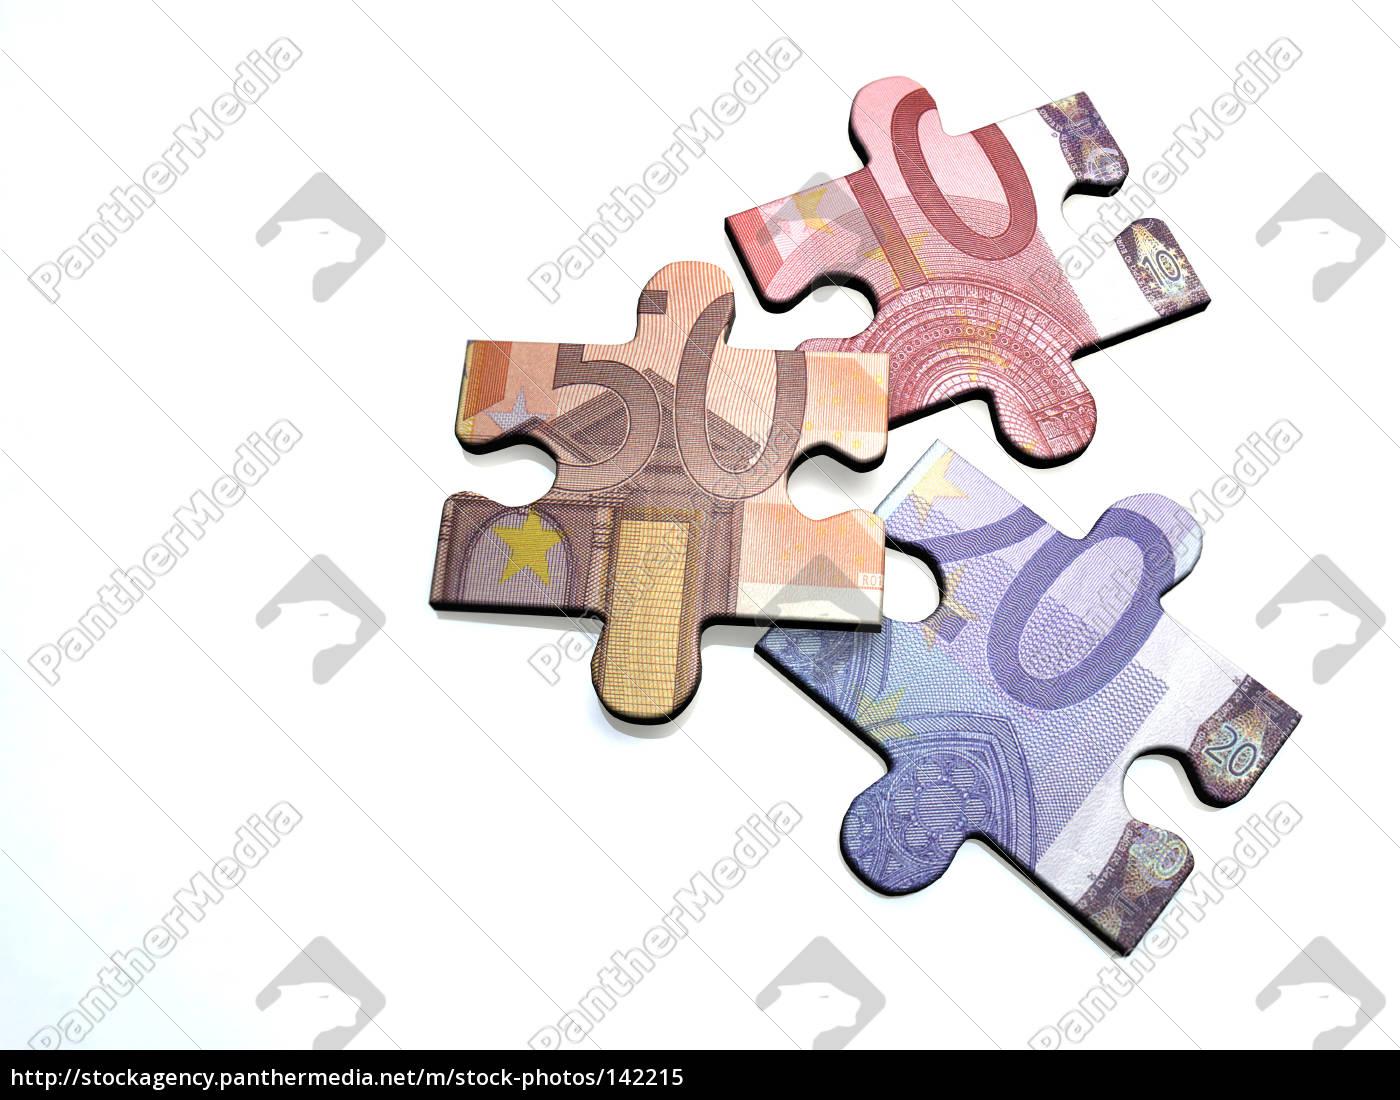 europuzzle, 2 - 142215